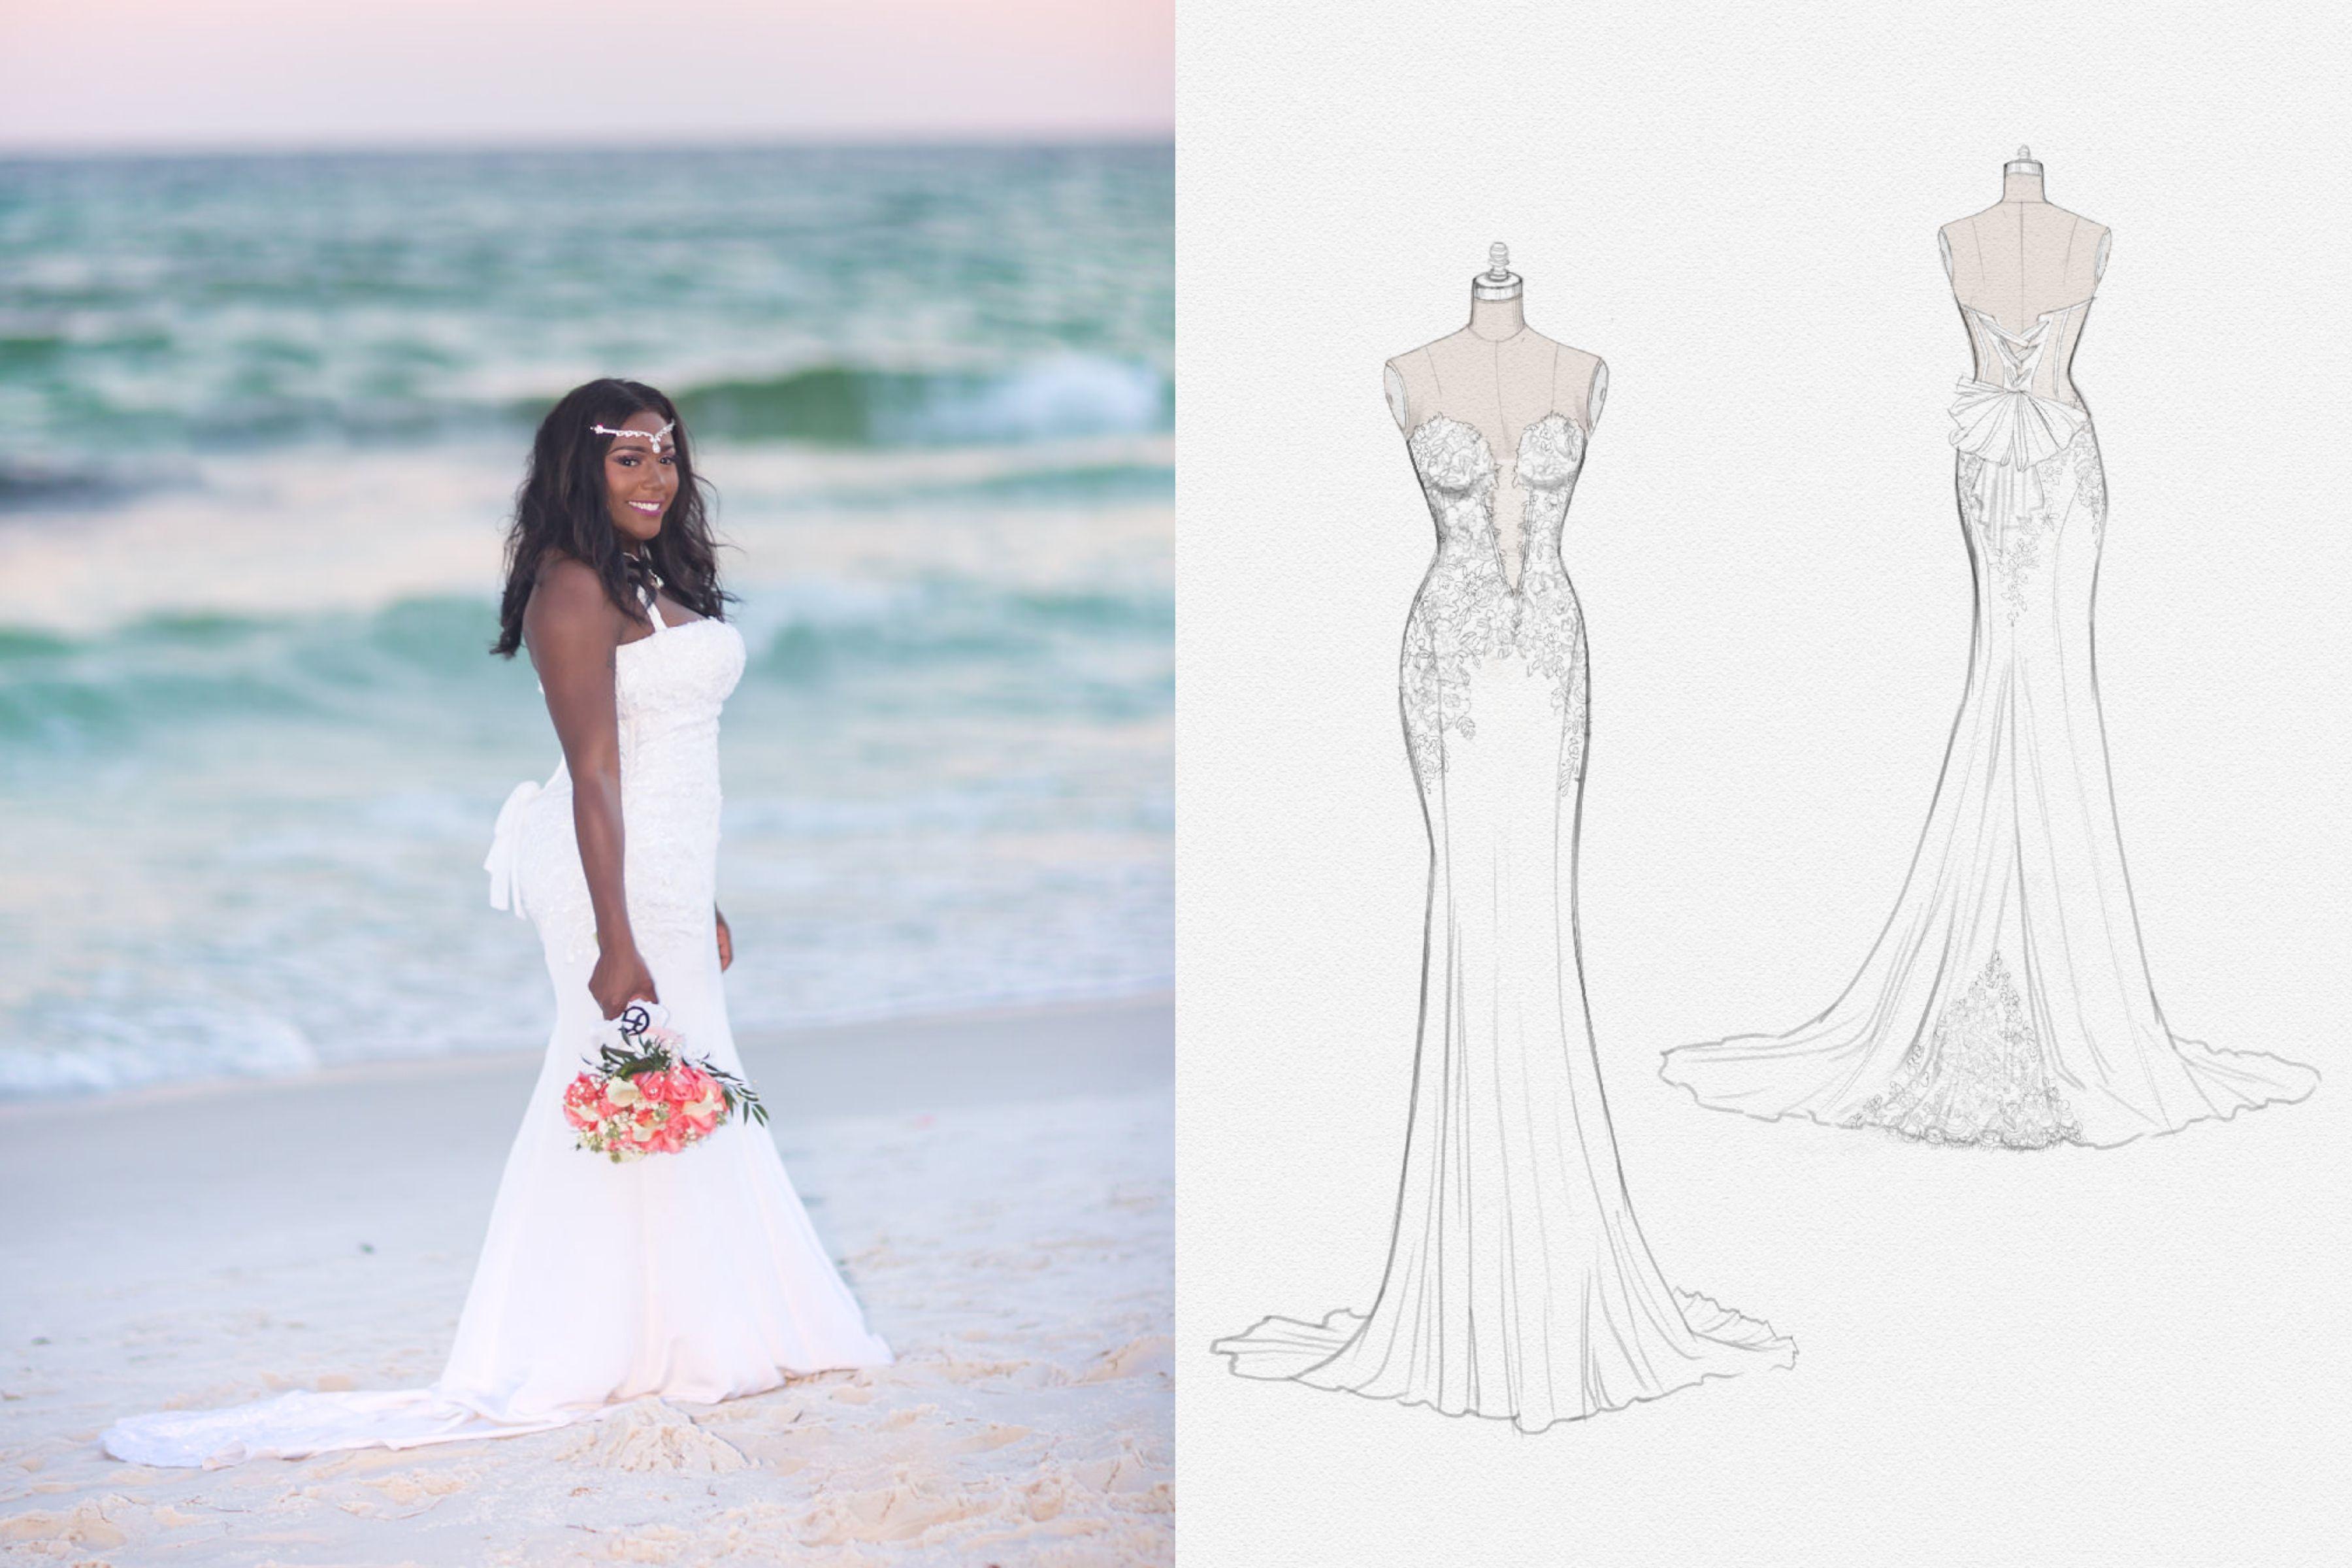 Beachside wedding + custom Anomalie gown. Casual beach